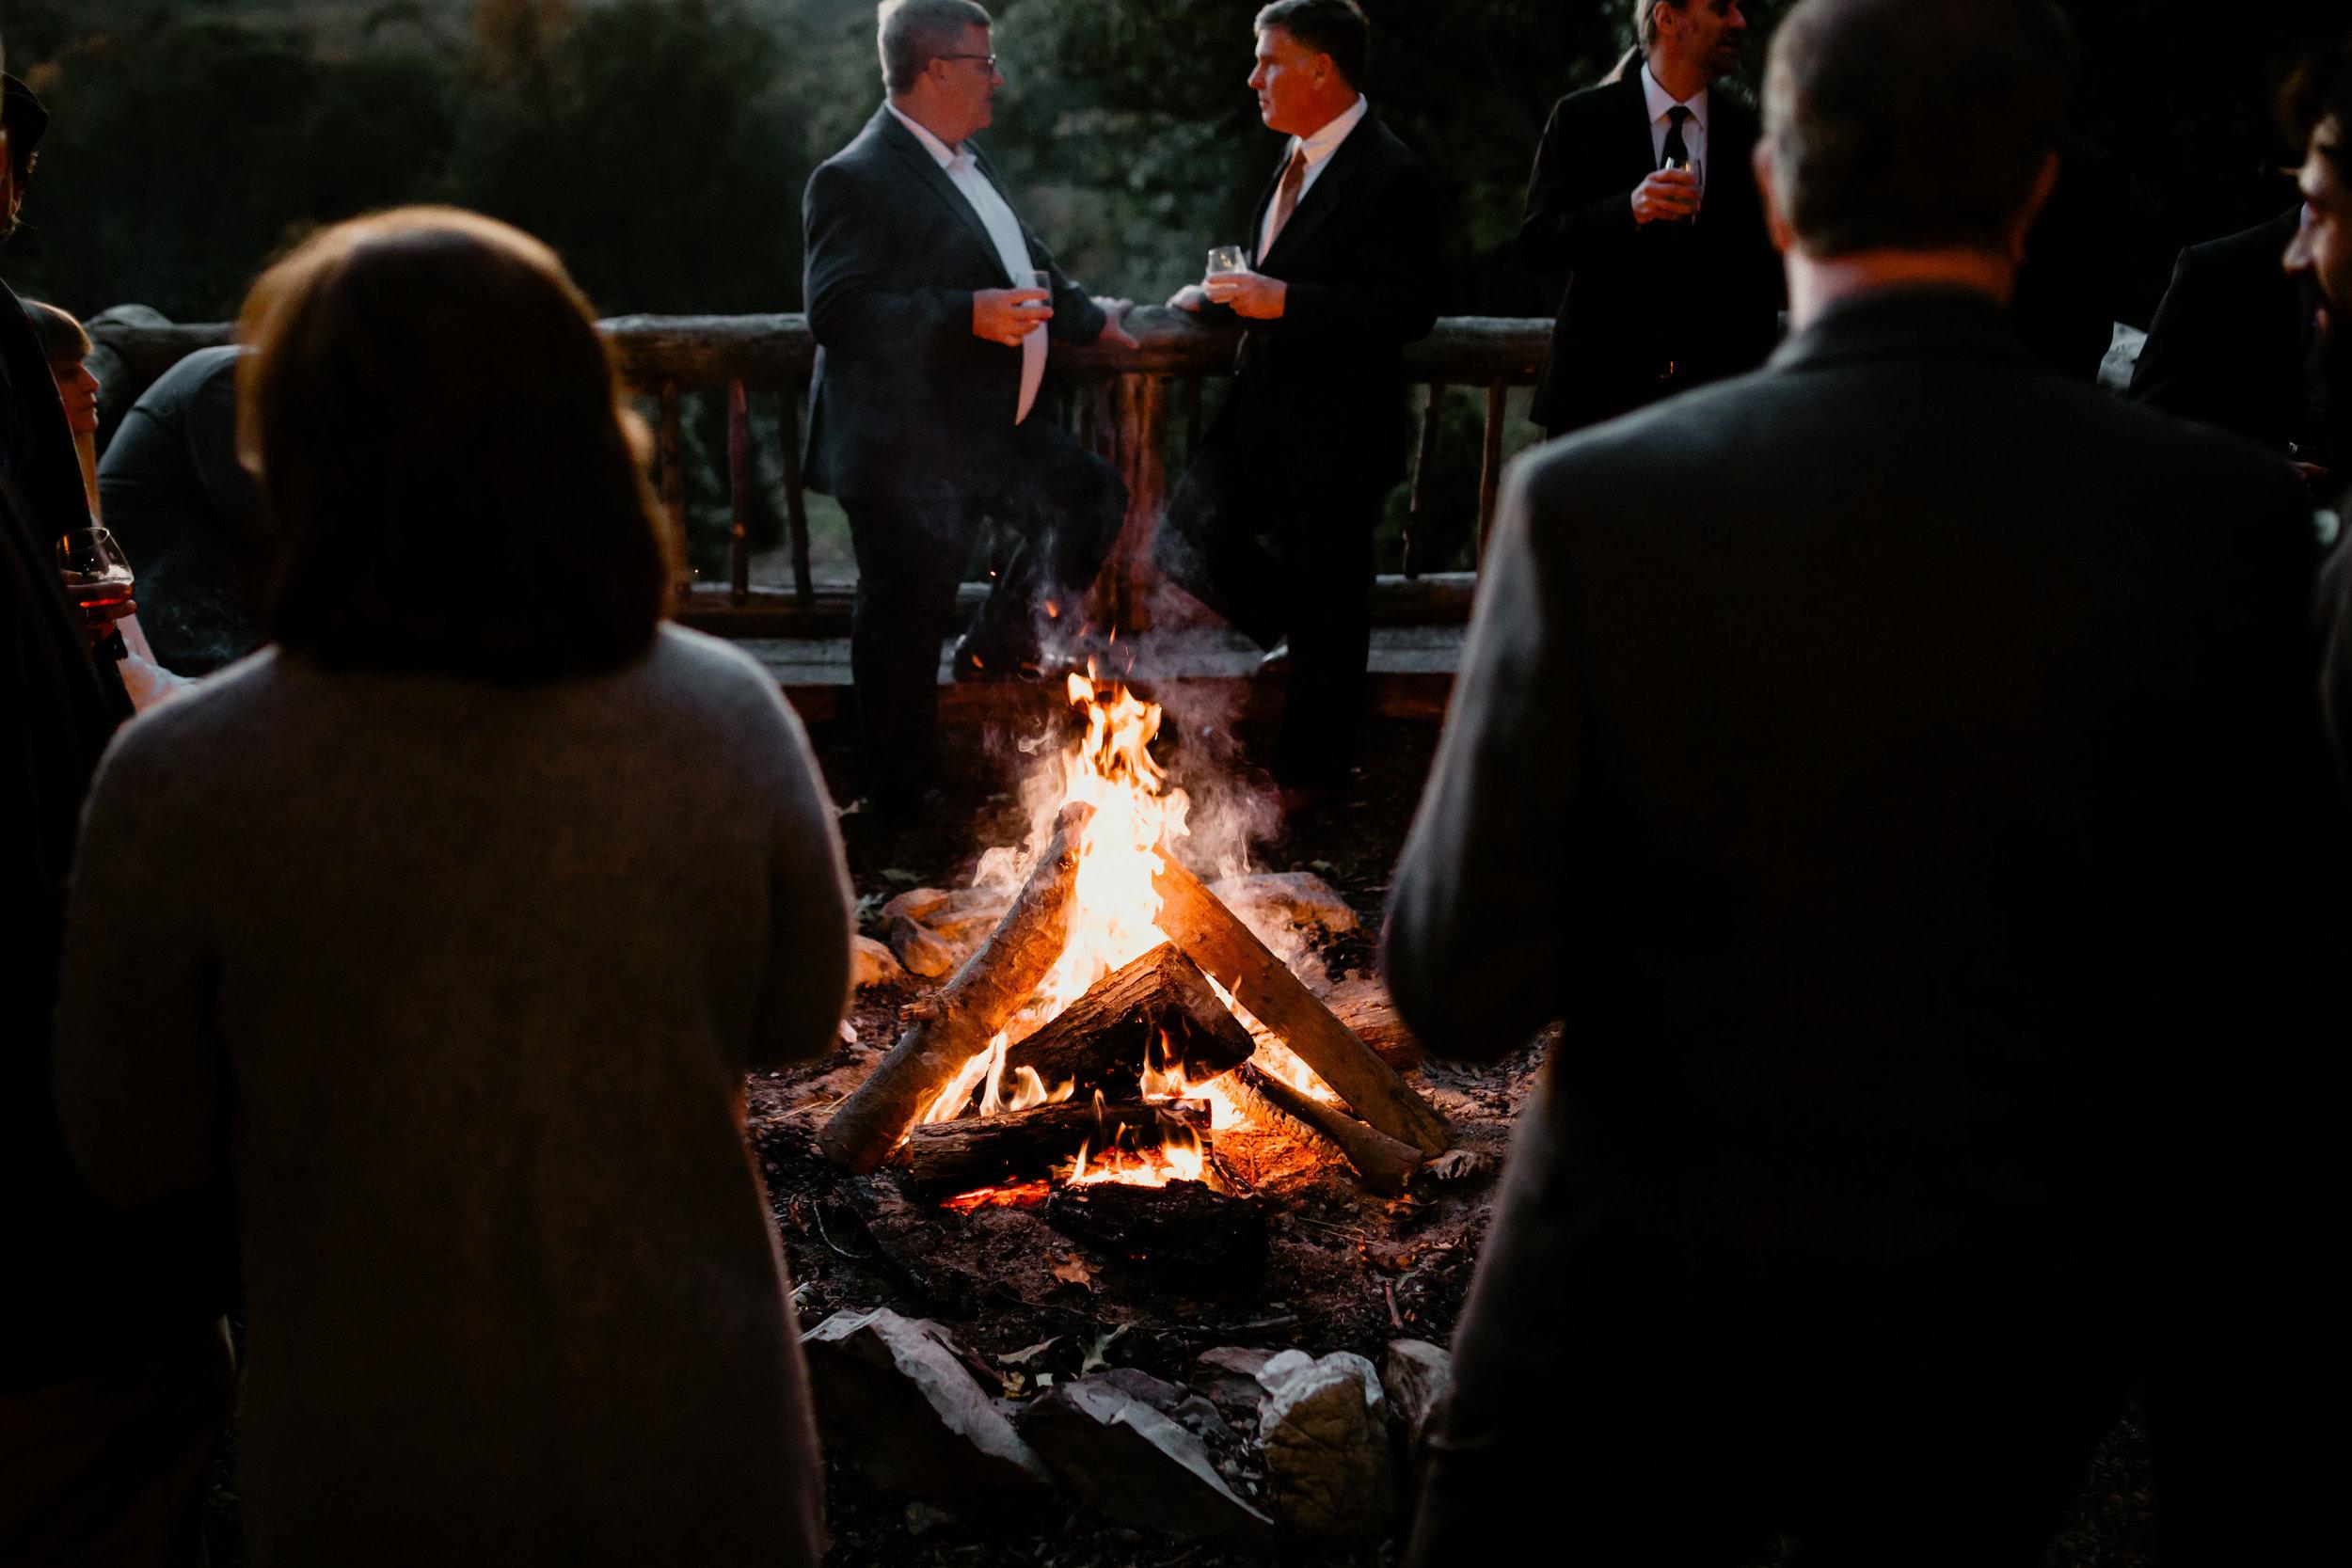 young-love-media-rustic-fall-autumn-wedding-emmerich-tree-farm-hudson-valley-warwick-new-york-reception-11.jpg